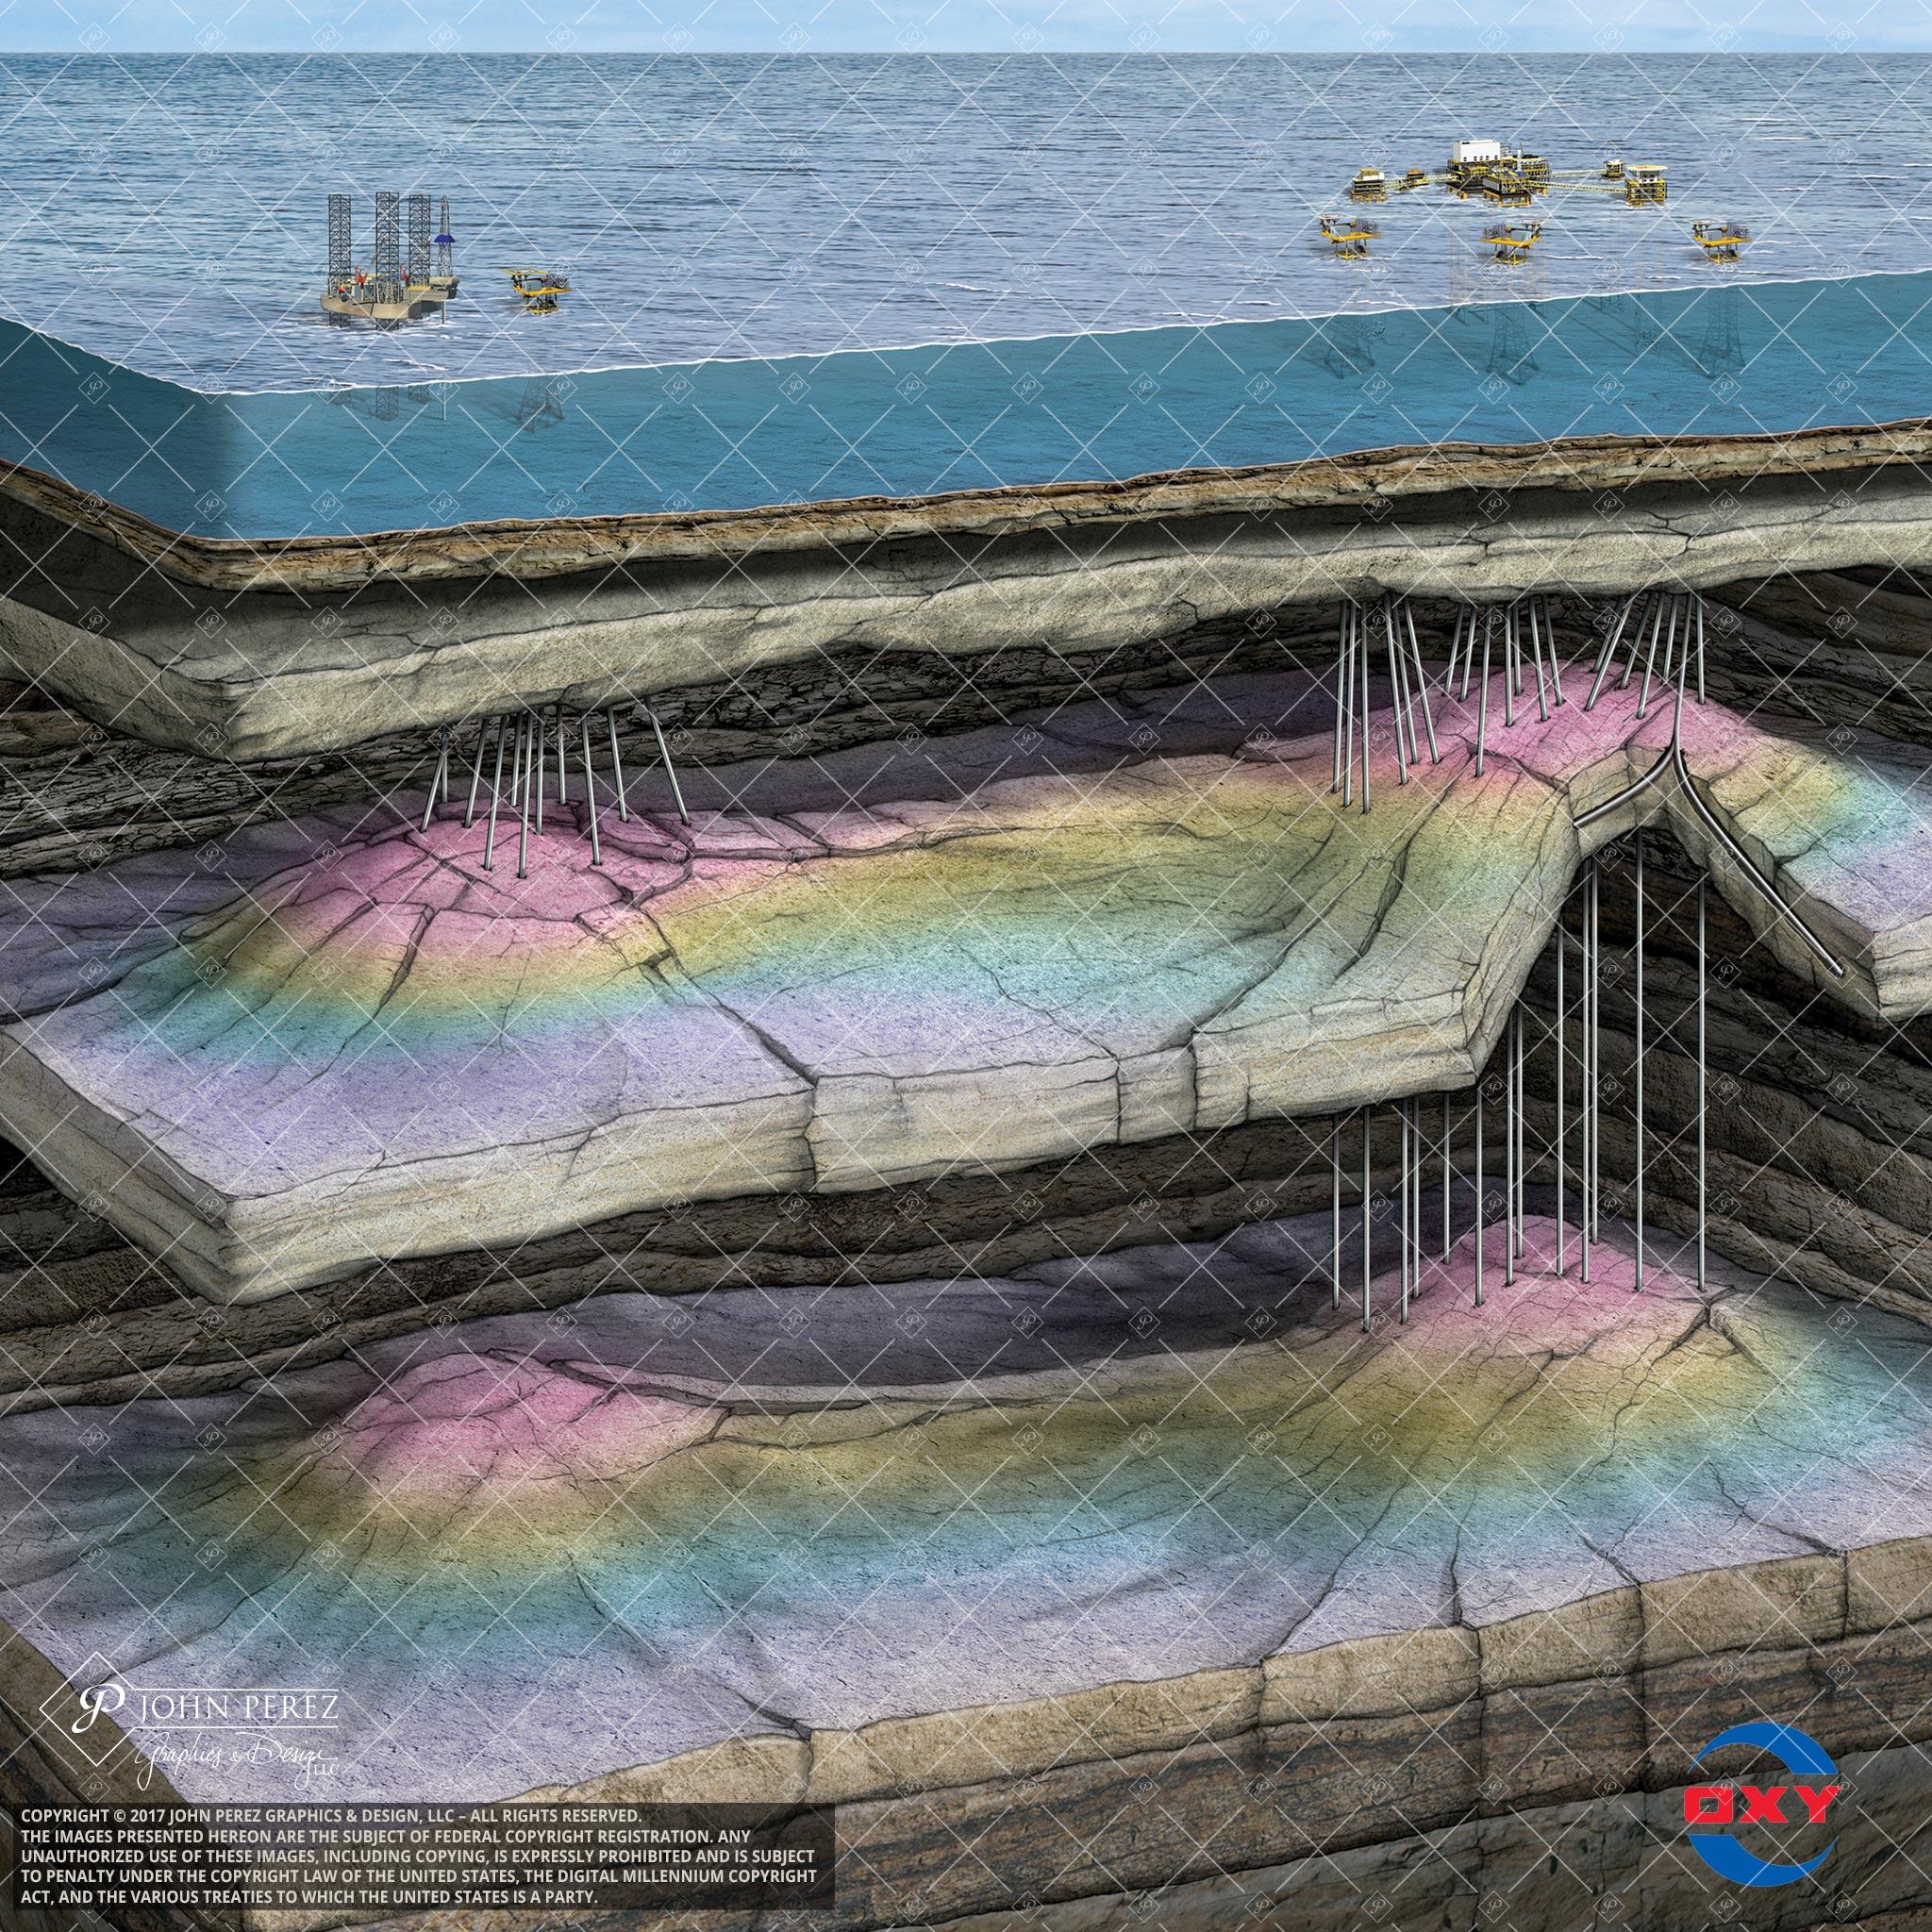 Oxy Jackup Oil Gas Illustration, John Perez Graphics, offshore, schematic, OS33, production platform, geology illustration